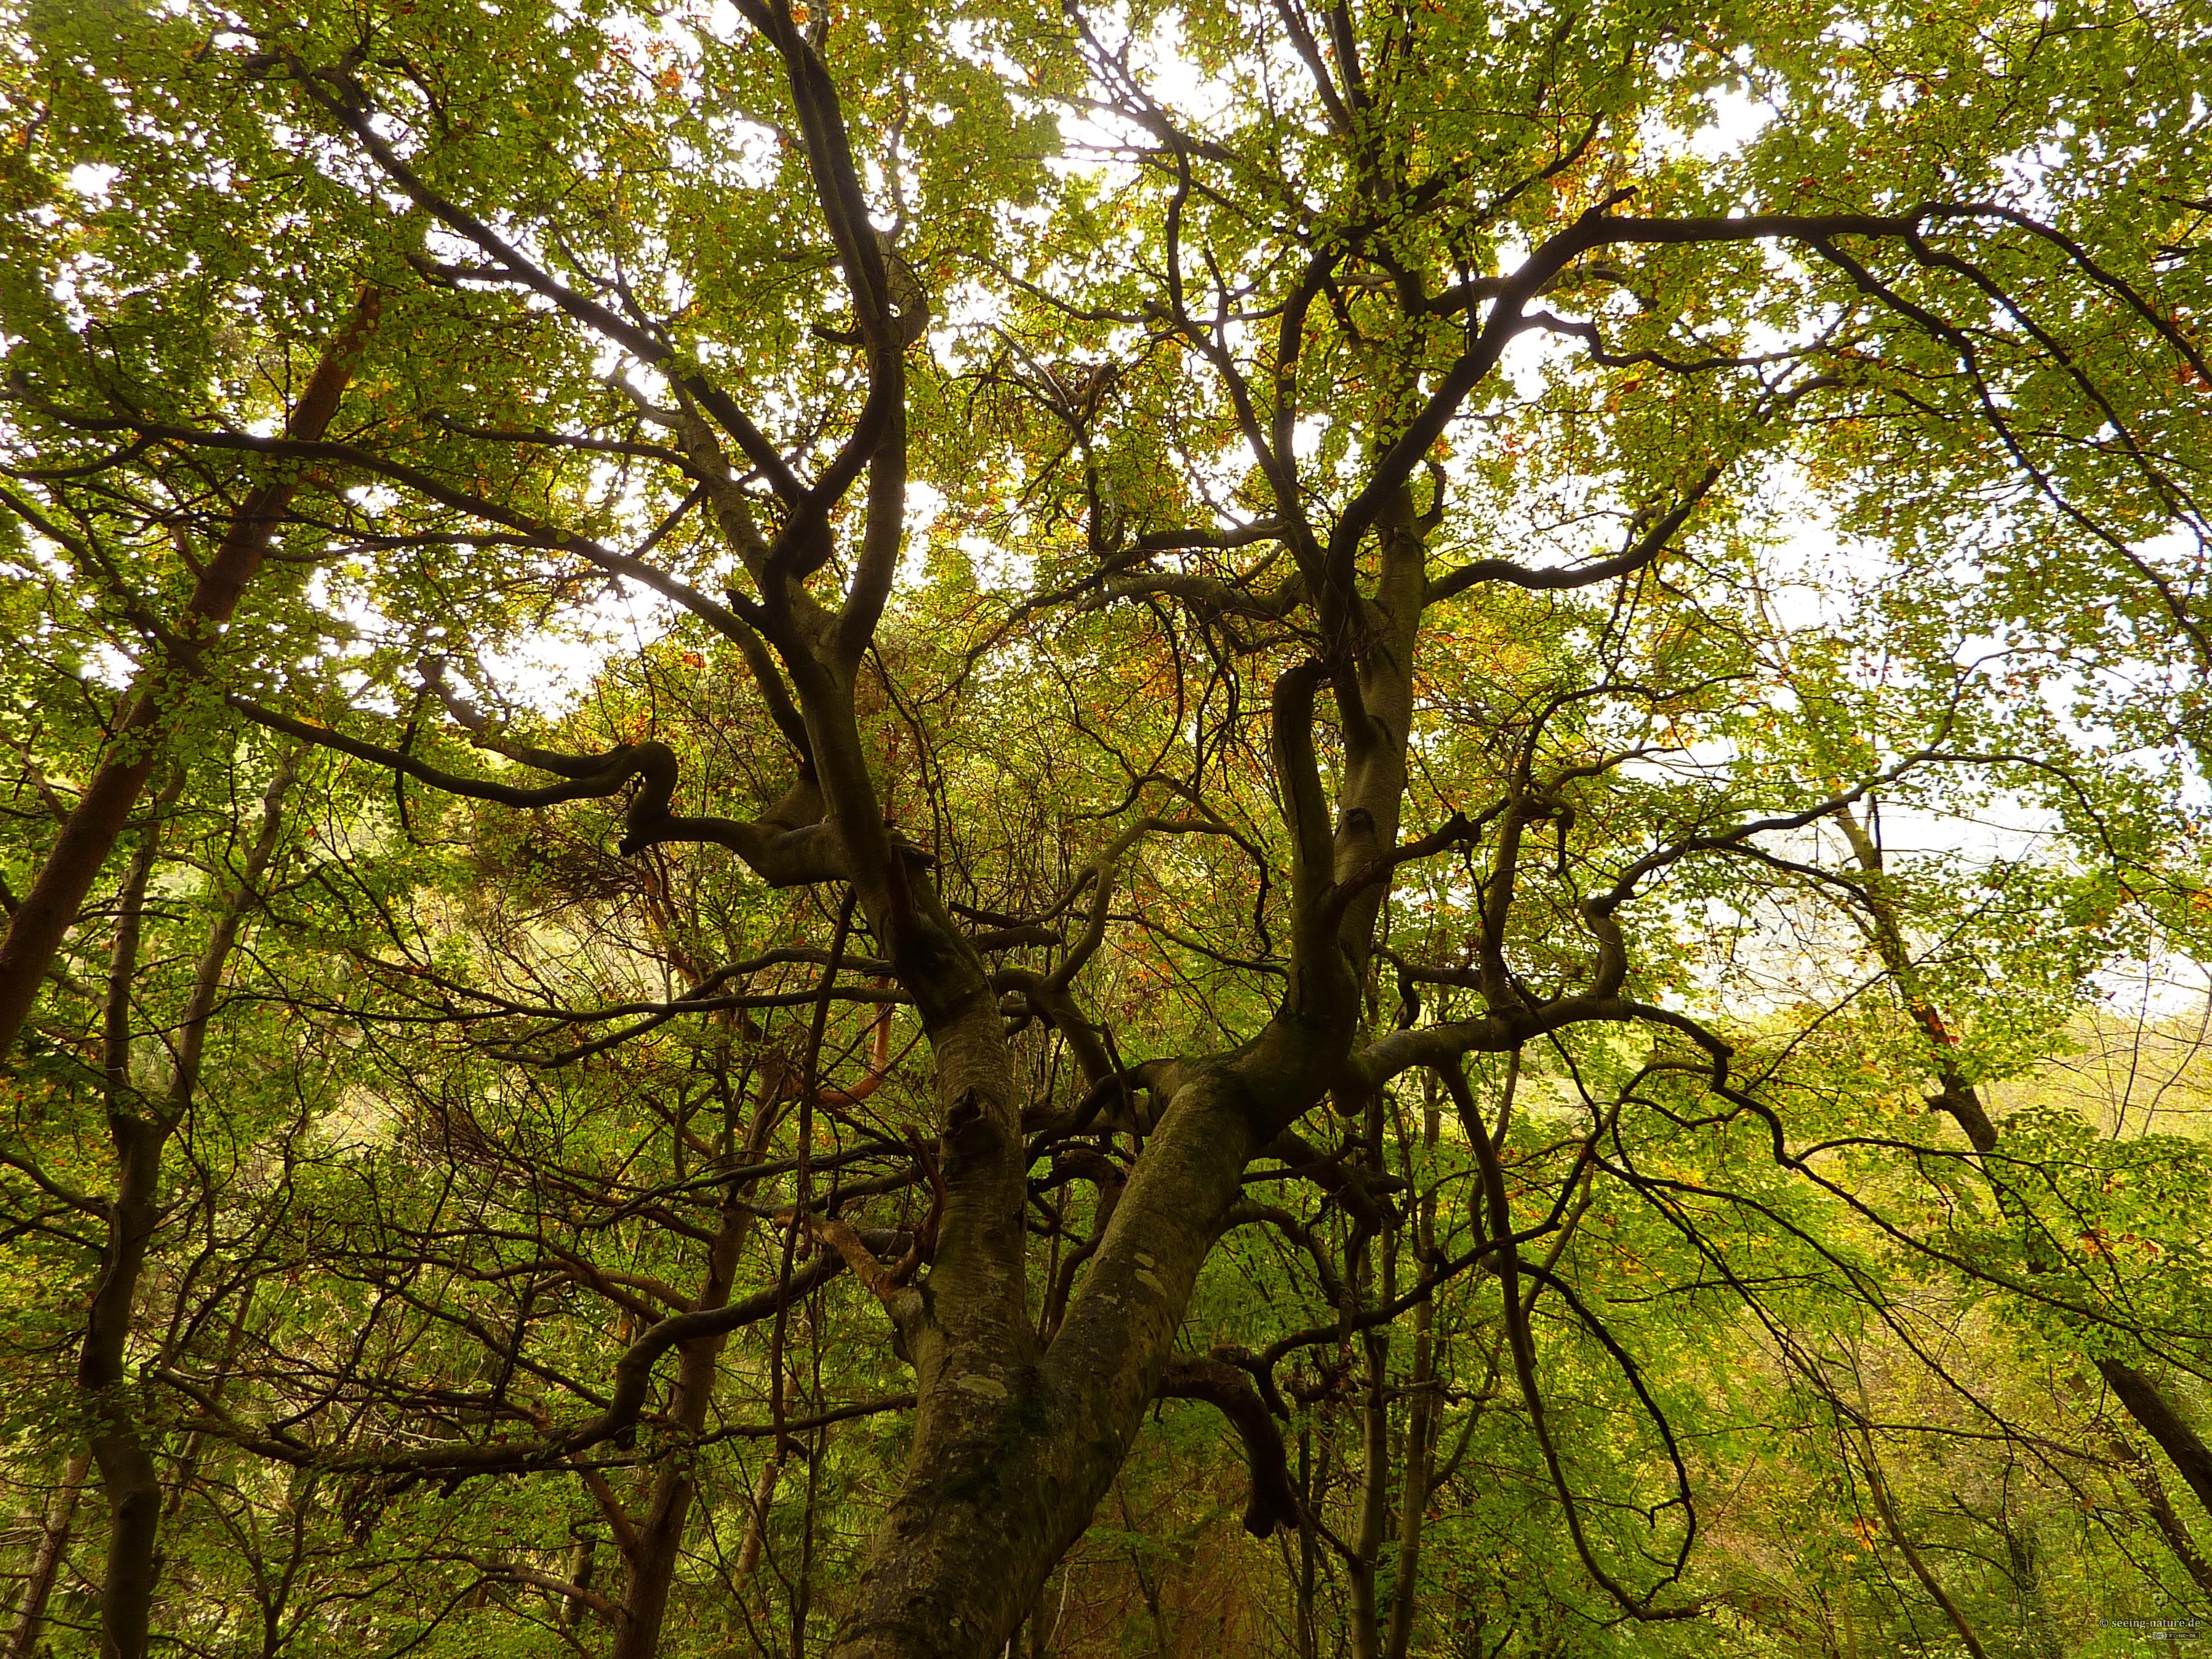 Branching Green